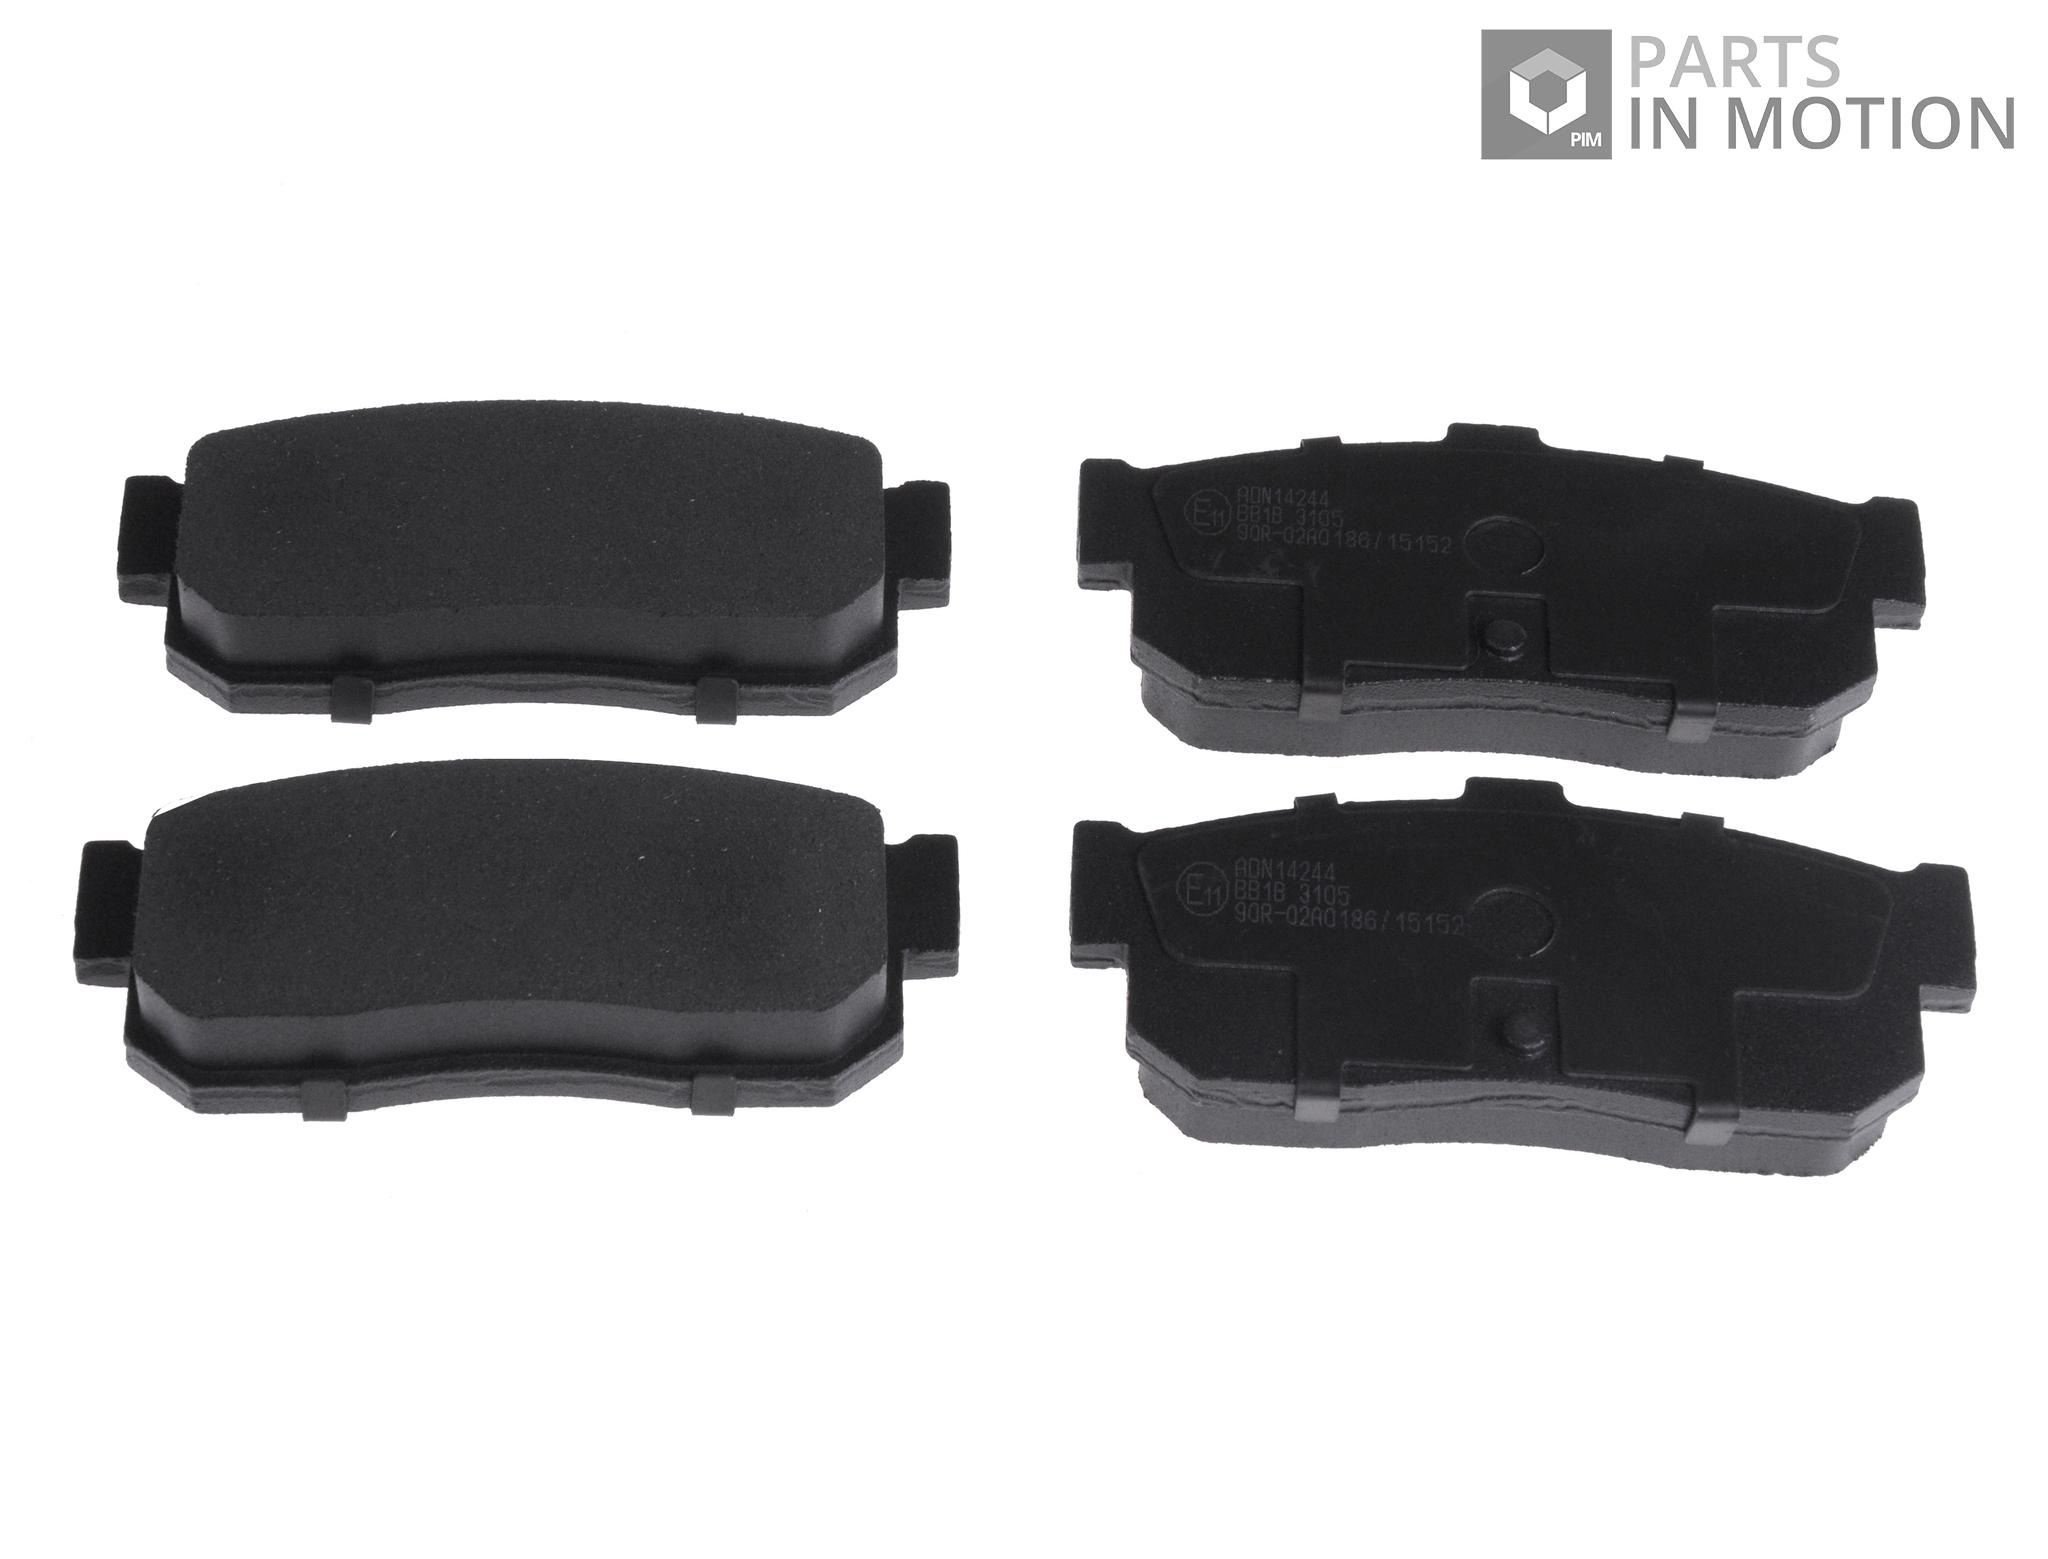 Brake-Pads-Set-fits-NISSAN-SUNNY-N14-2-0-Rear-90-to-96-SR20DE-ADL-Quality-New